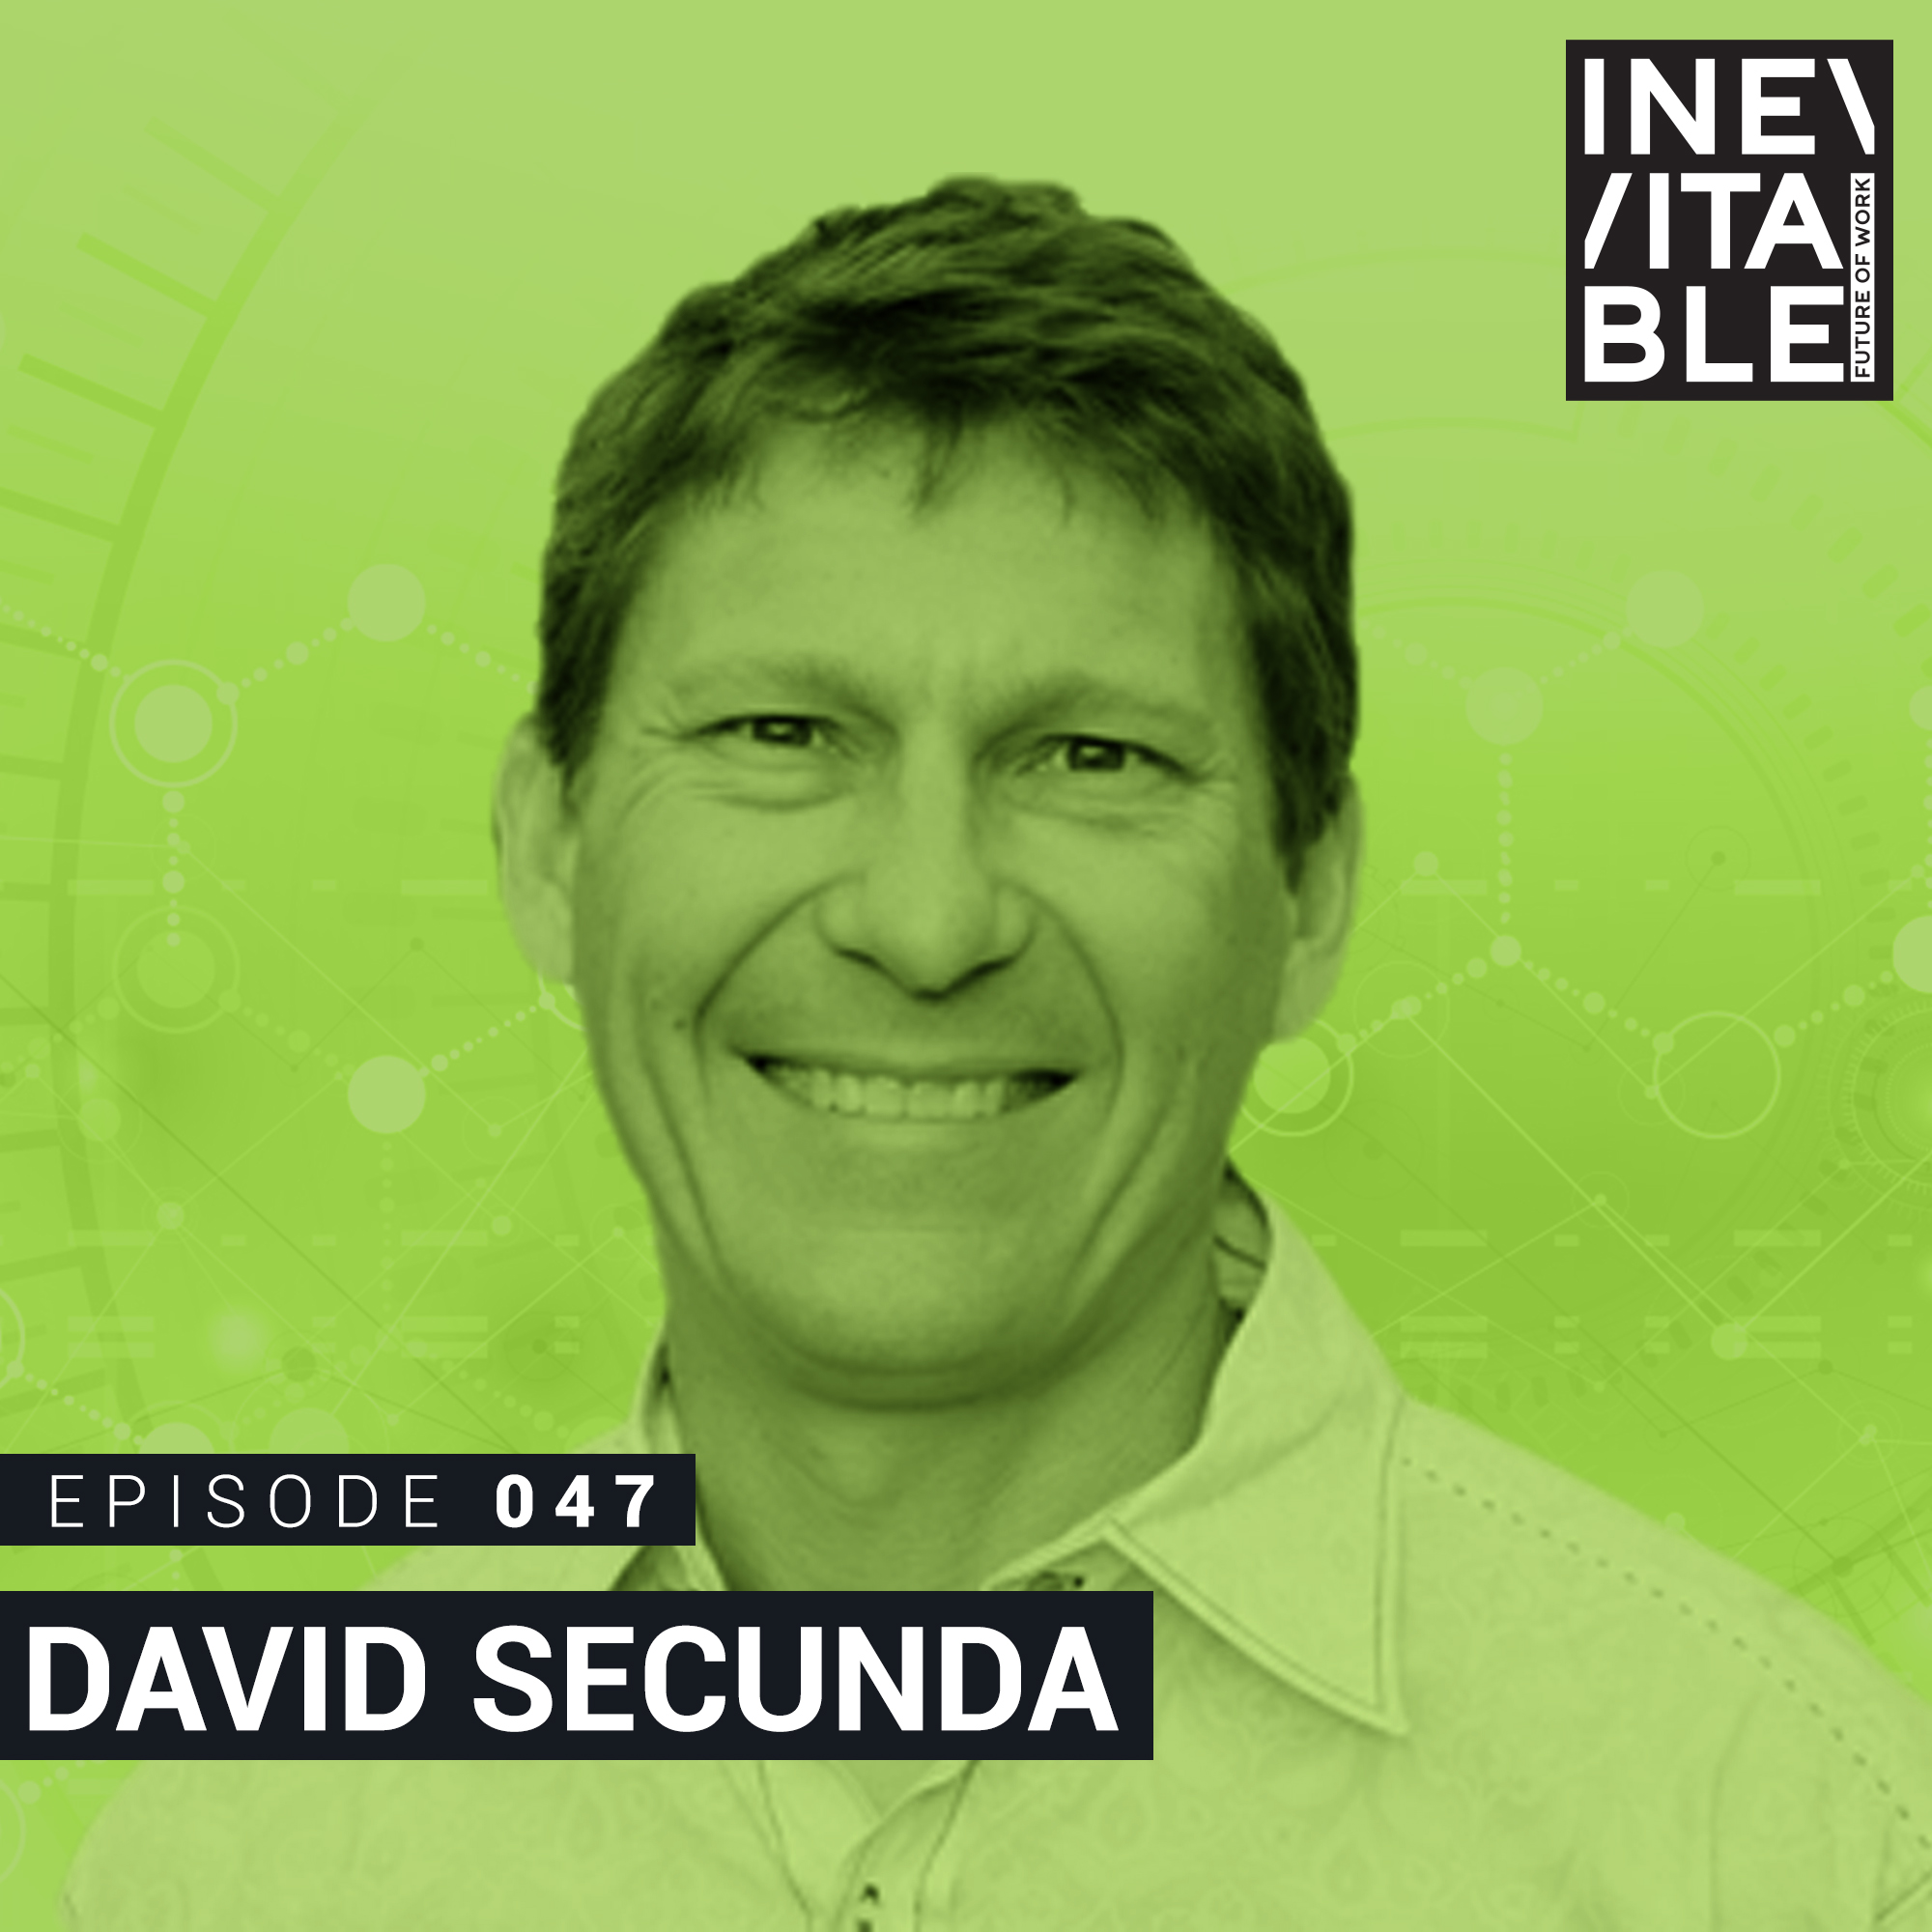 David Secunda